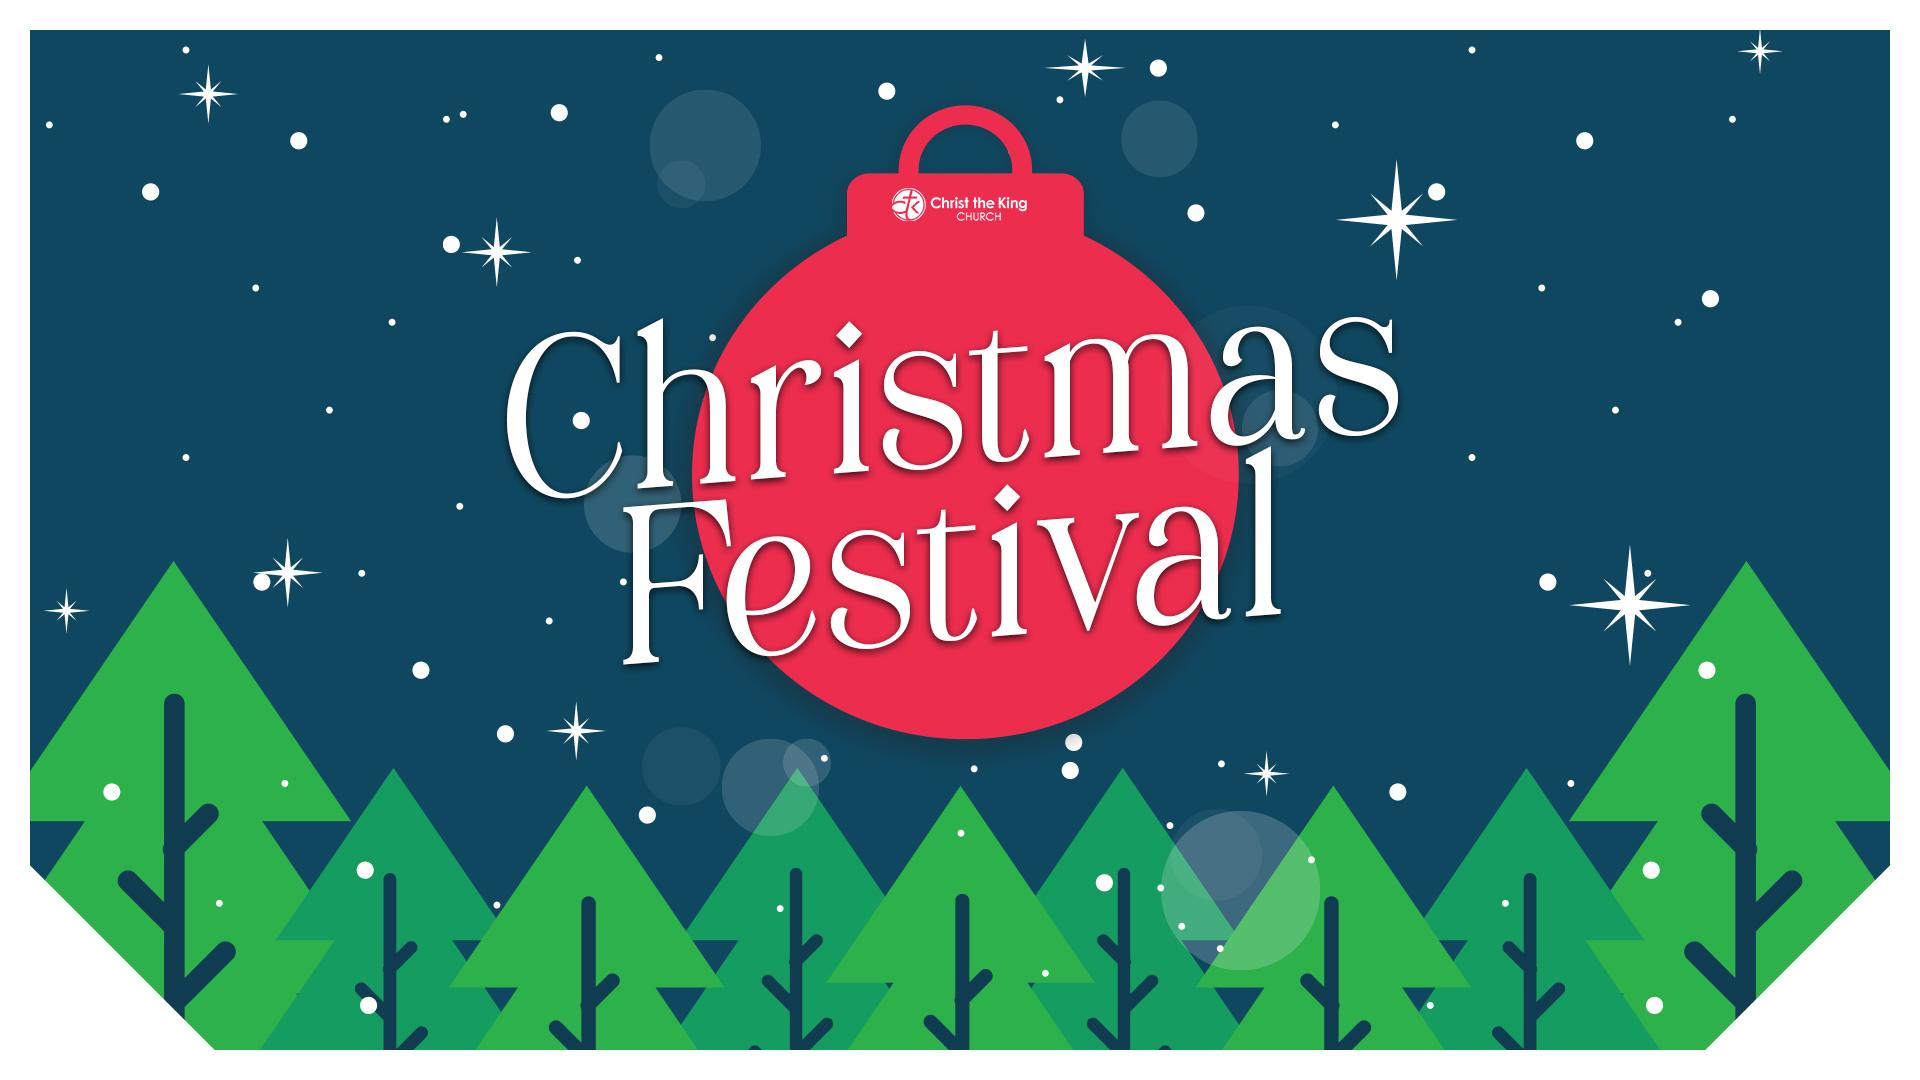 Christmas Festival title